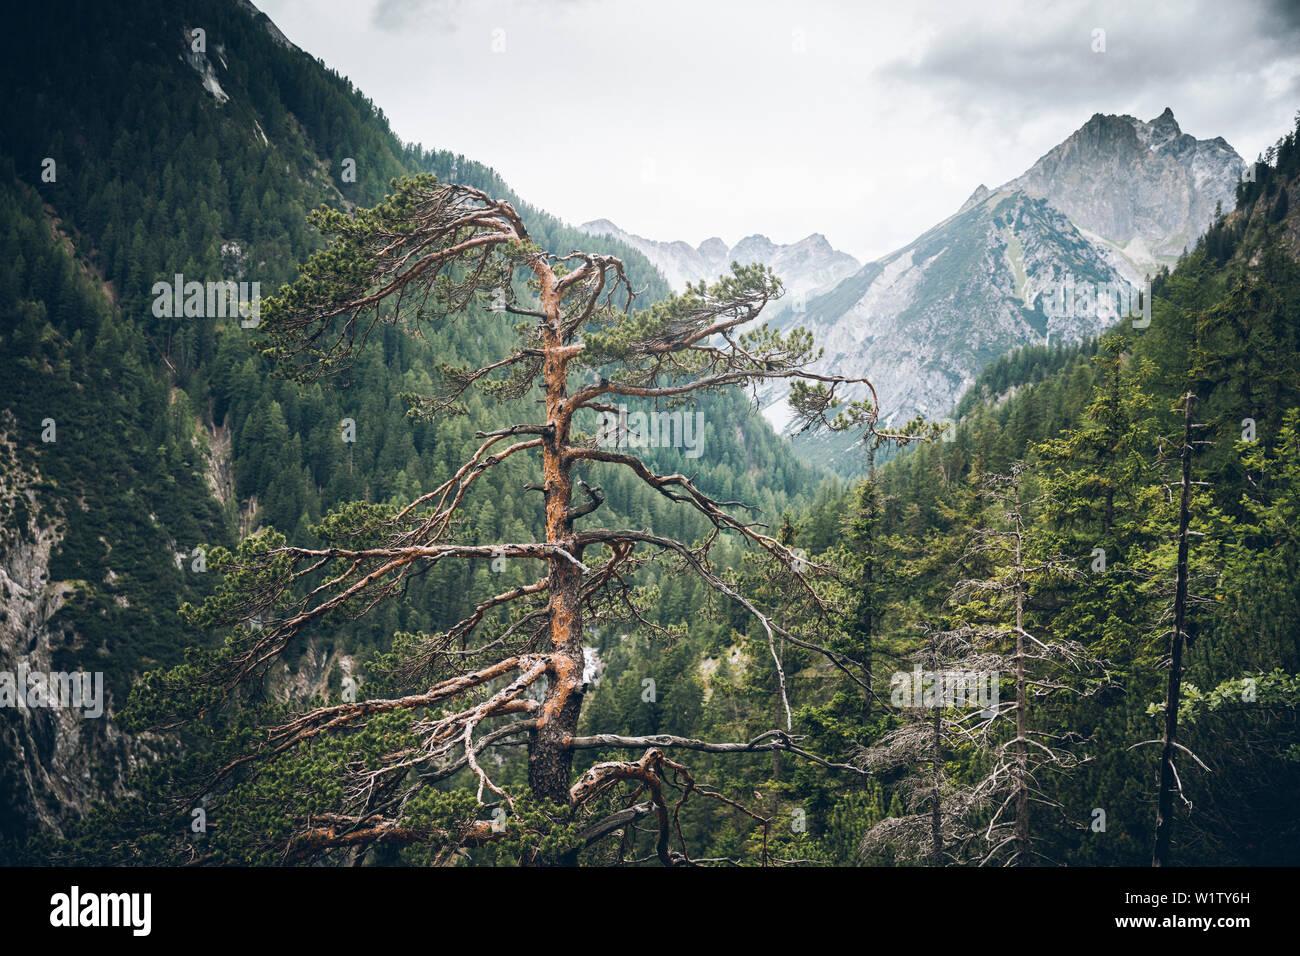 Tree tops with mountain peak in the background, E5, Alpenüberquerung, 3rd stage, Seescharte,Inntal, Memminger Hütte to Unterloch Alm, tyrol, austria, - Stock Image